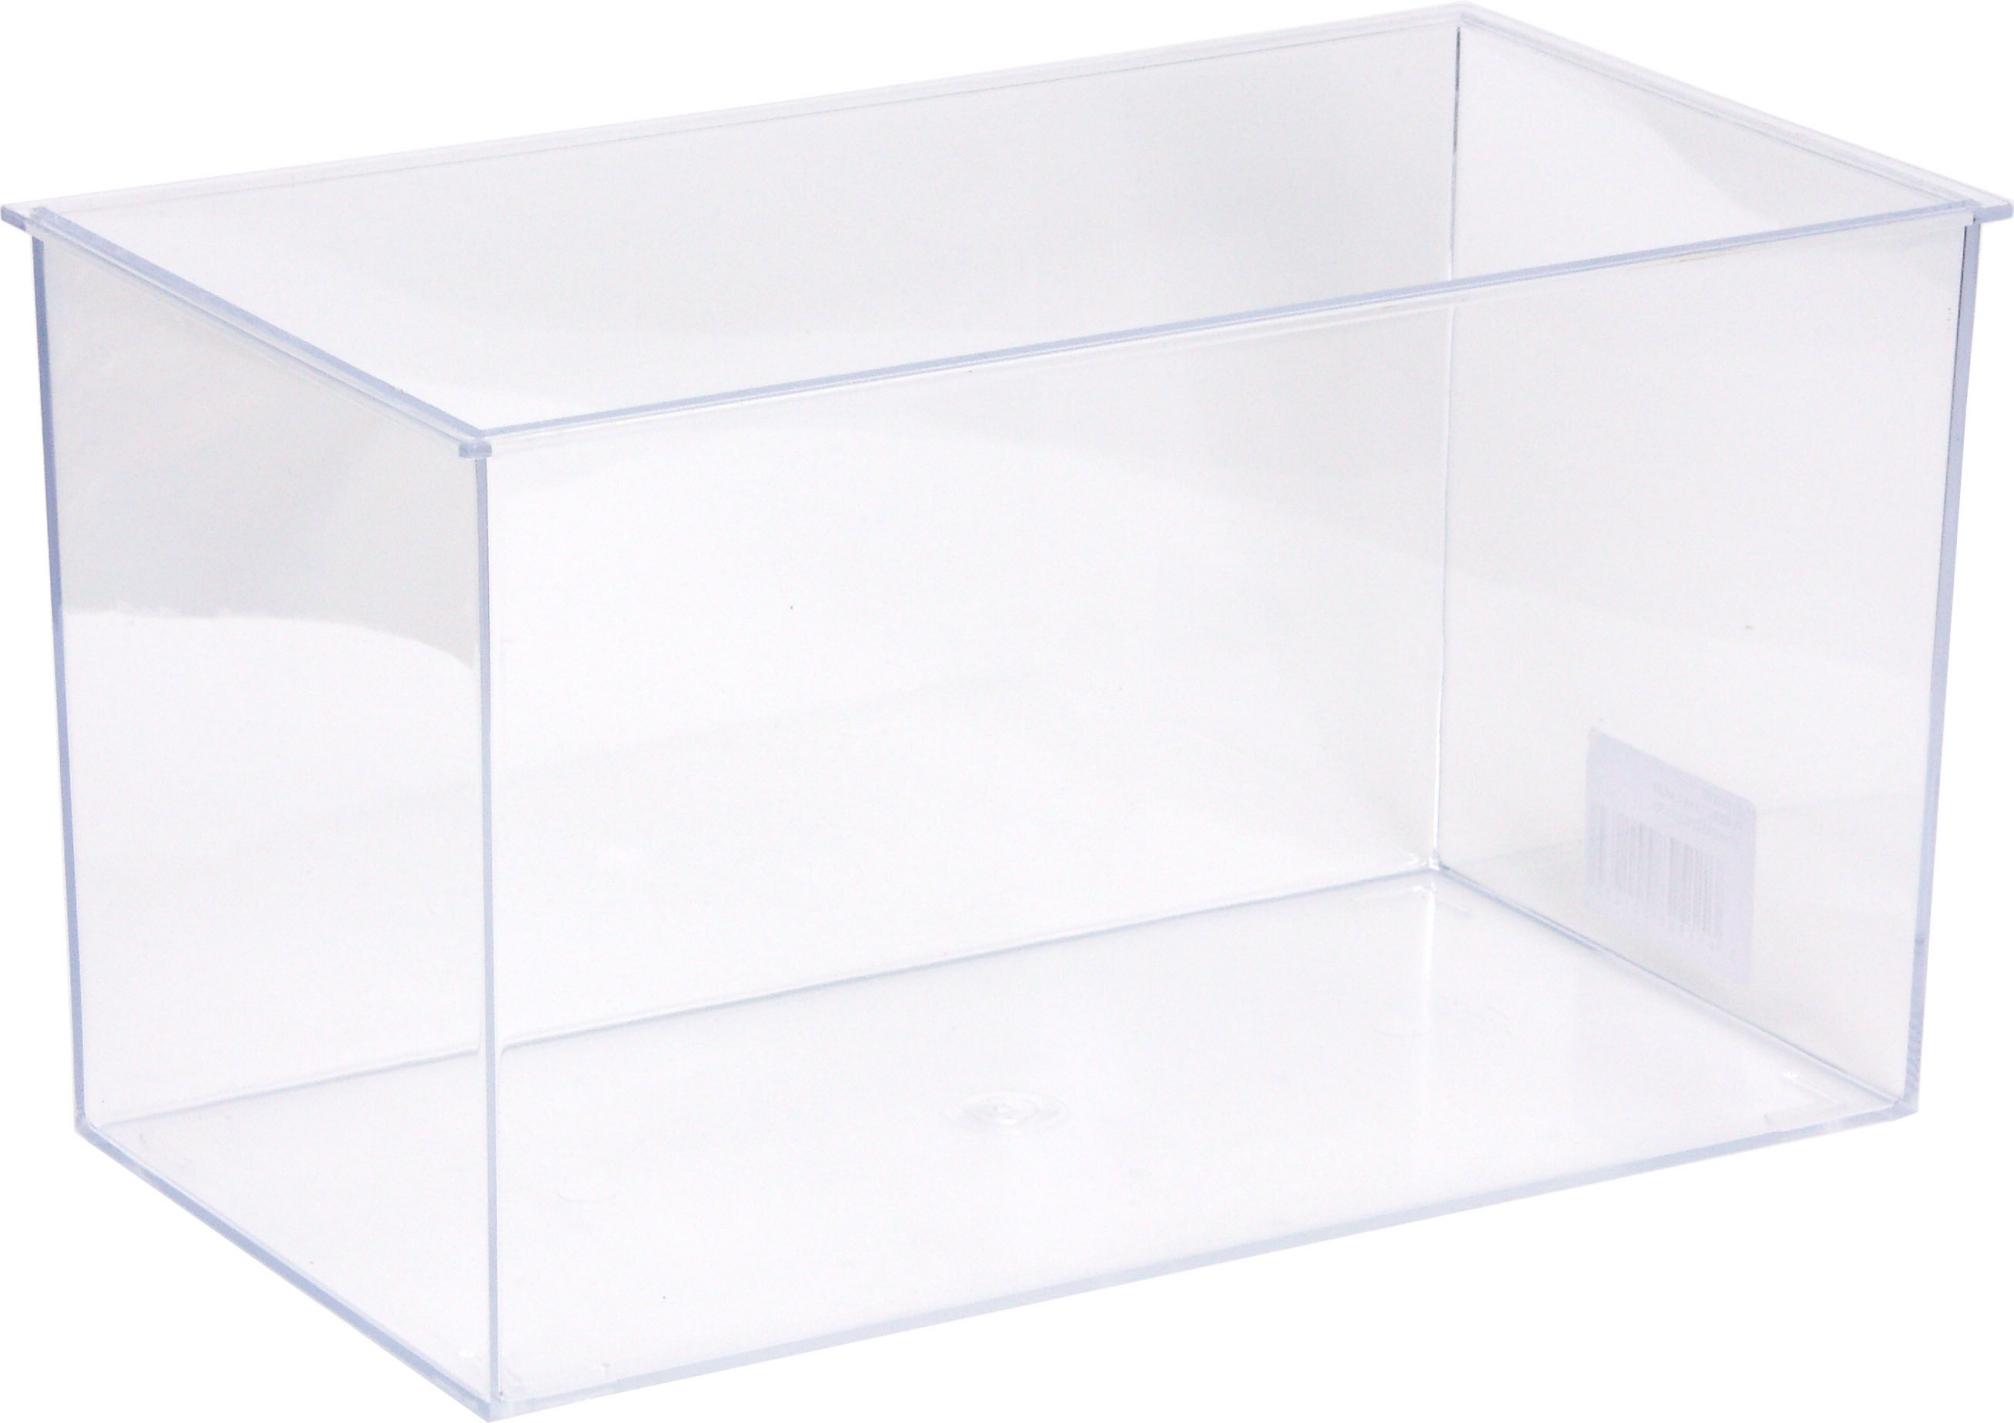 savic plastik aquarium kunststoff aquarium 3 6 11 22 liter. Black Bedroom Furniture Sets. Home Design Ideas